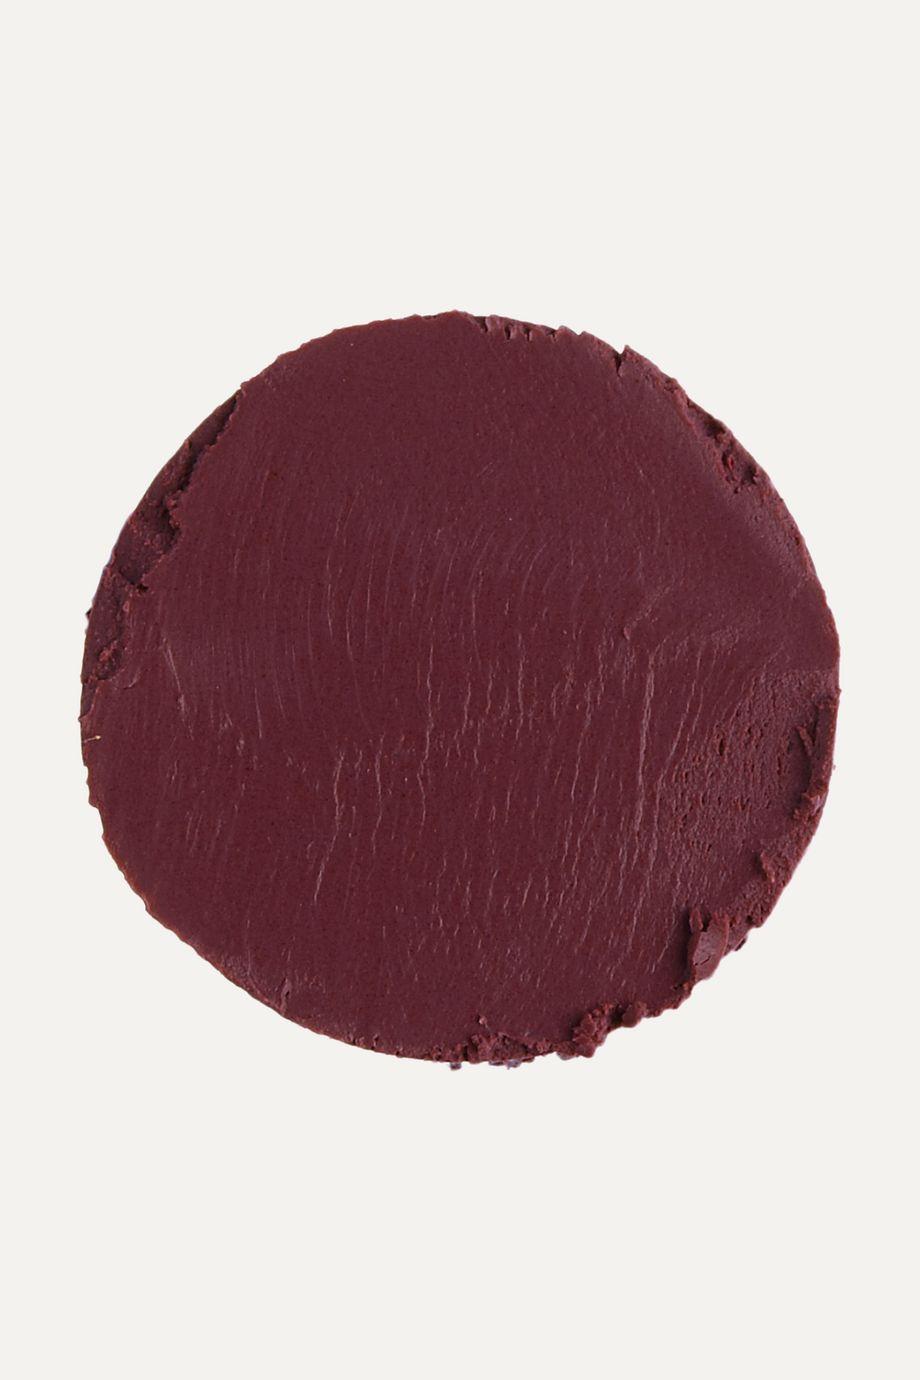 Kevyn Aucoin The Matte Lip Color - Bloodroses